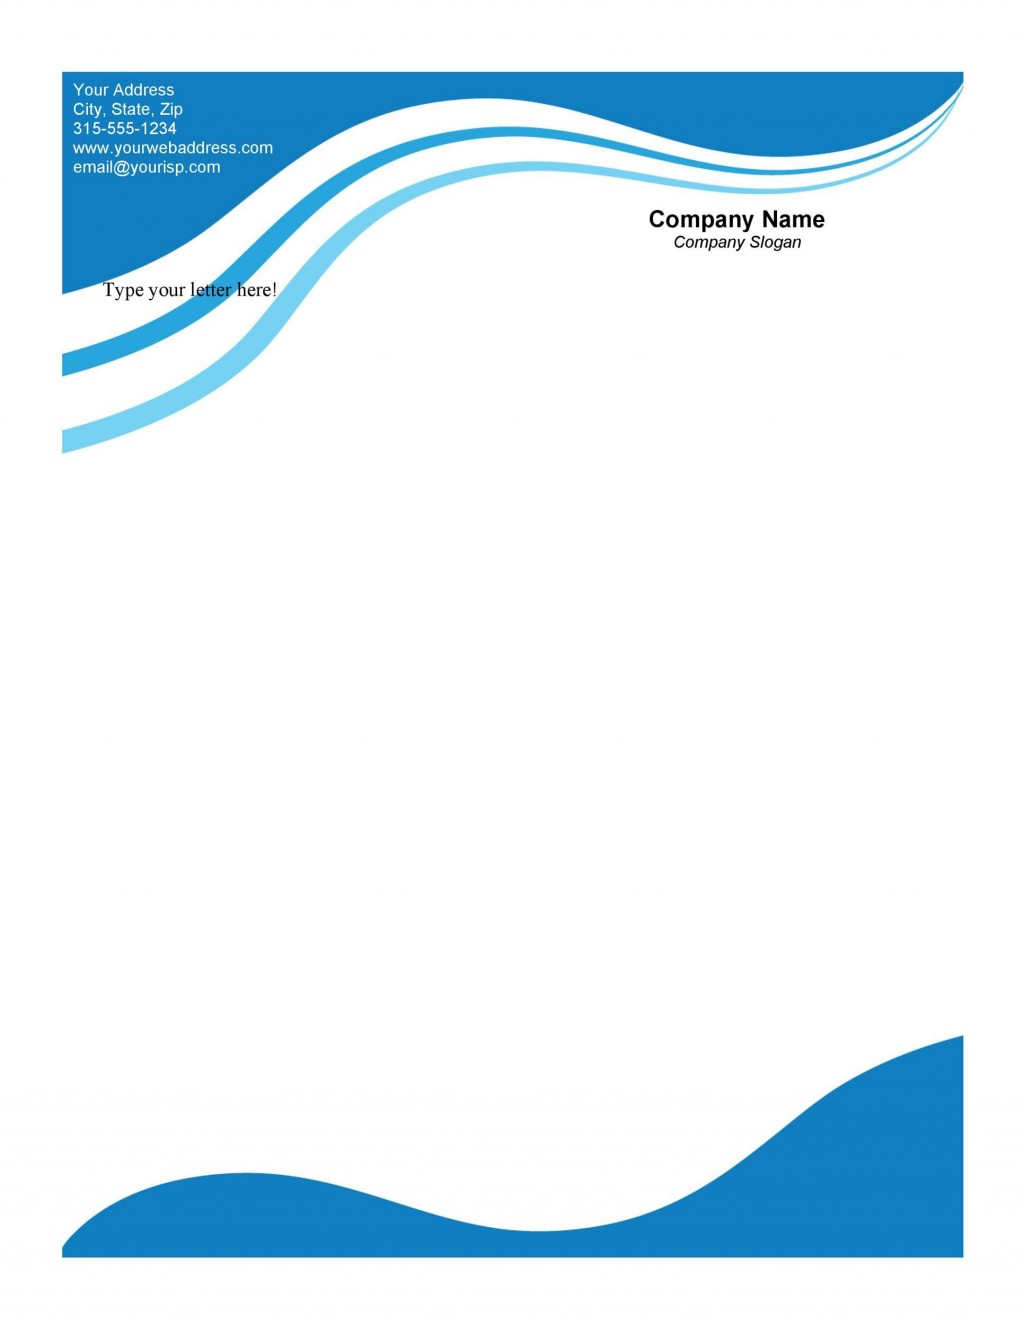 005 Sensational Letterhead Sample Free Download High Resolution  Construction Company TemplateLarge